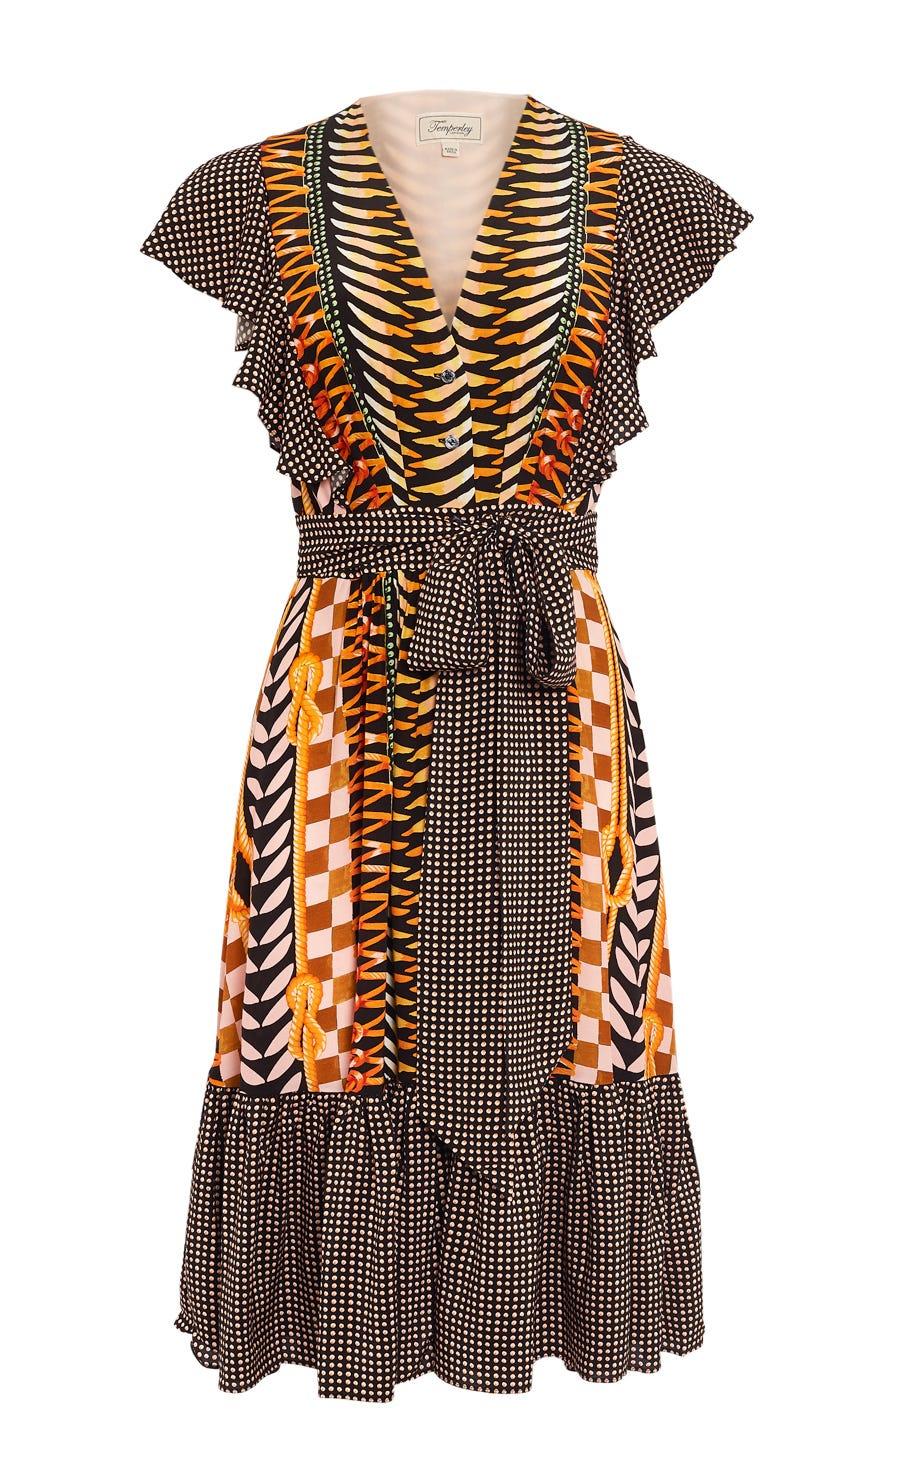 Sweetpea Day Dress